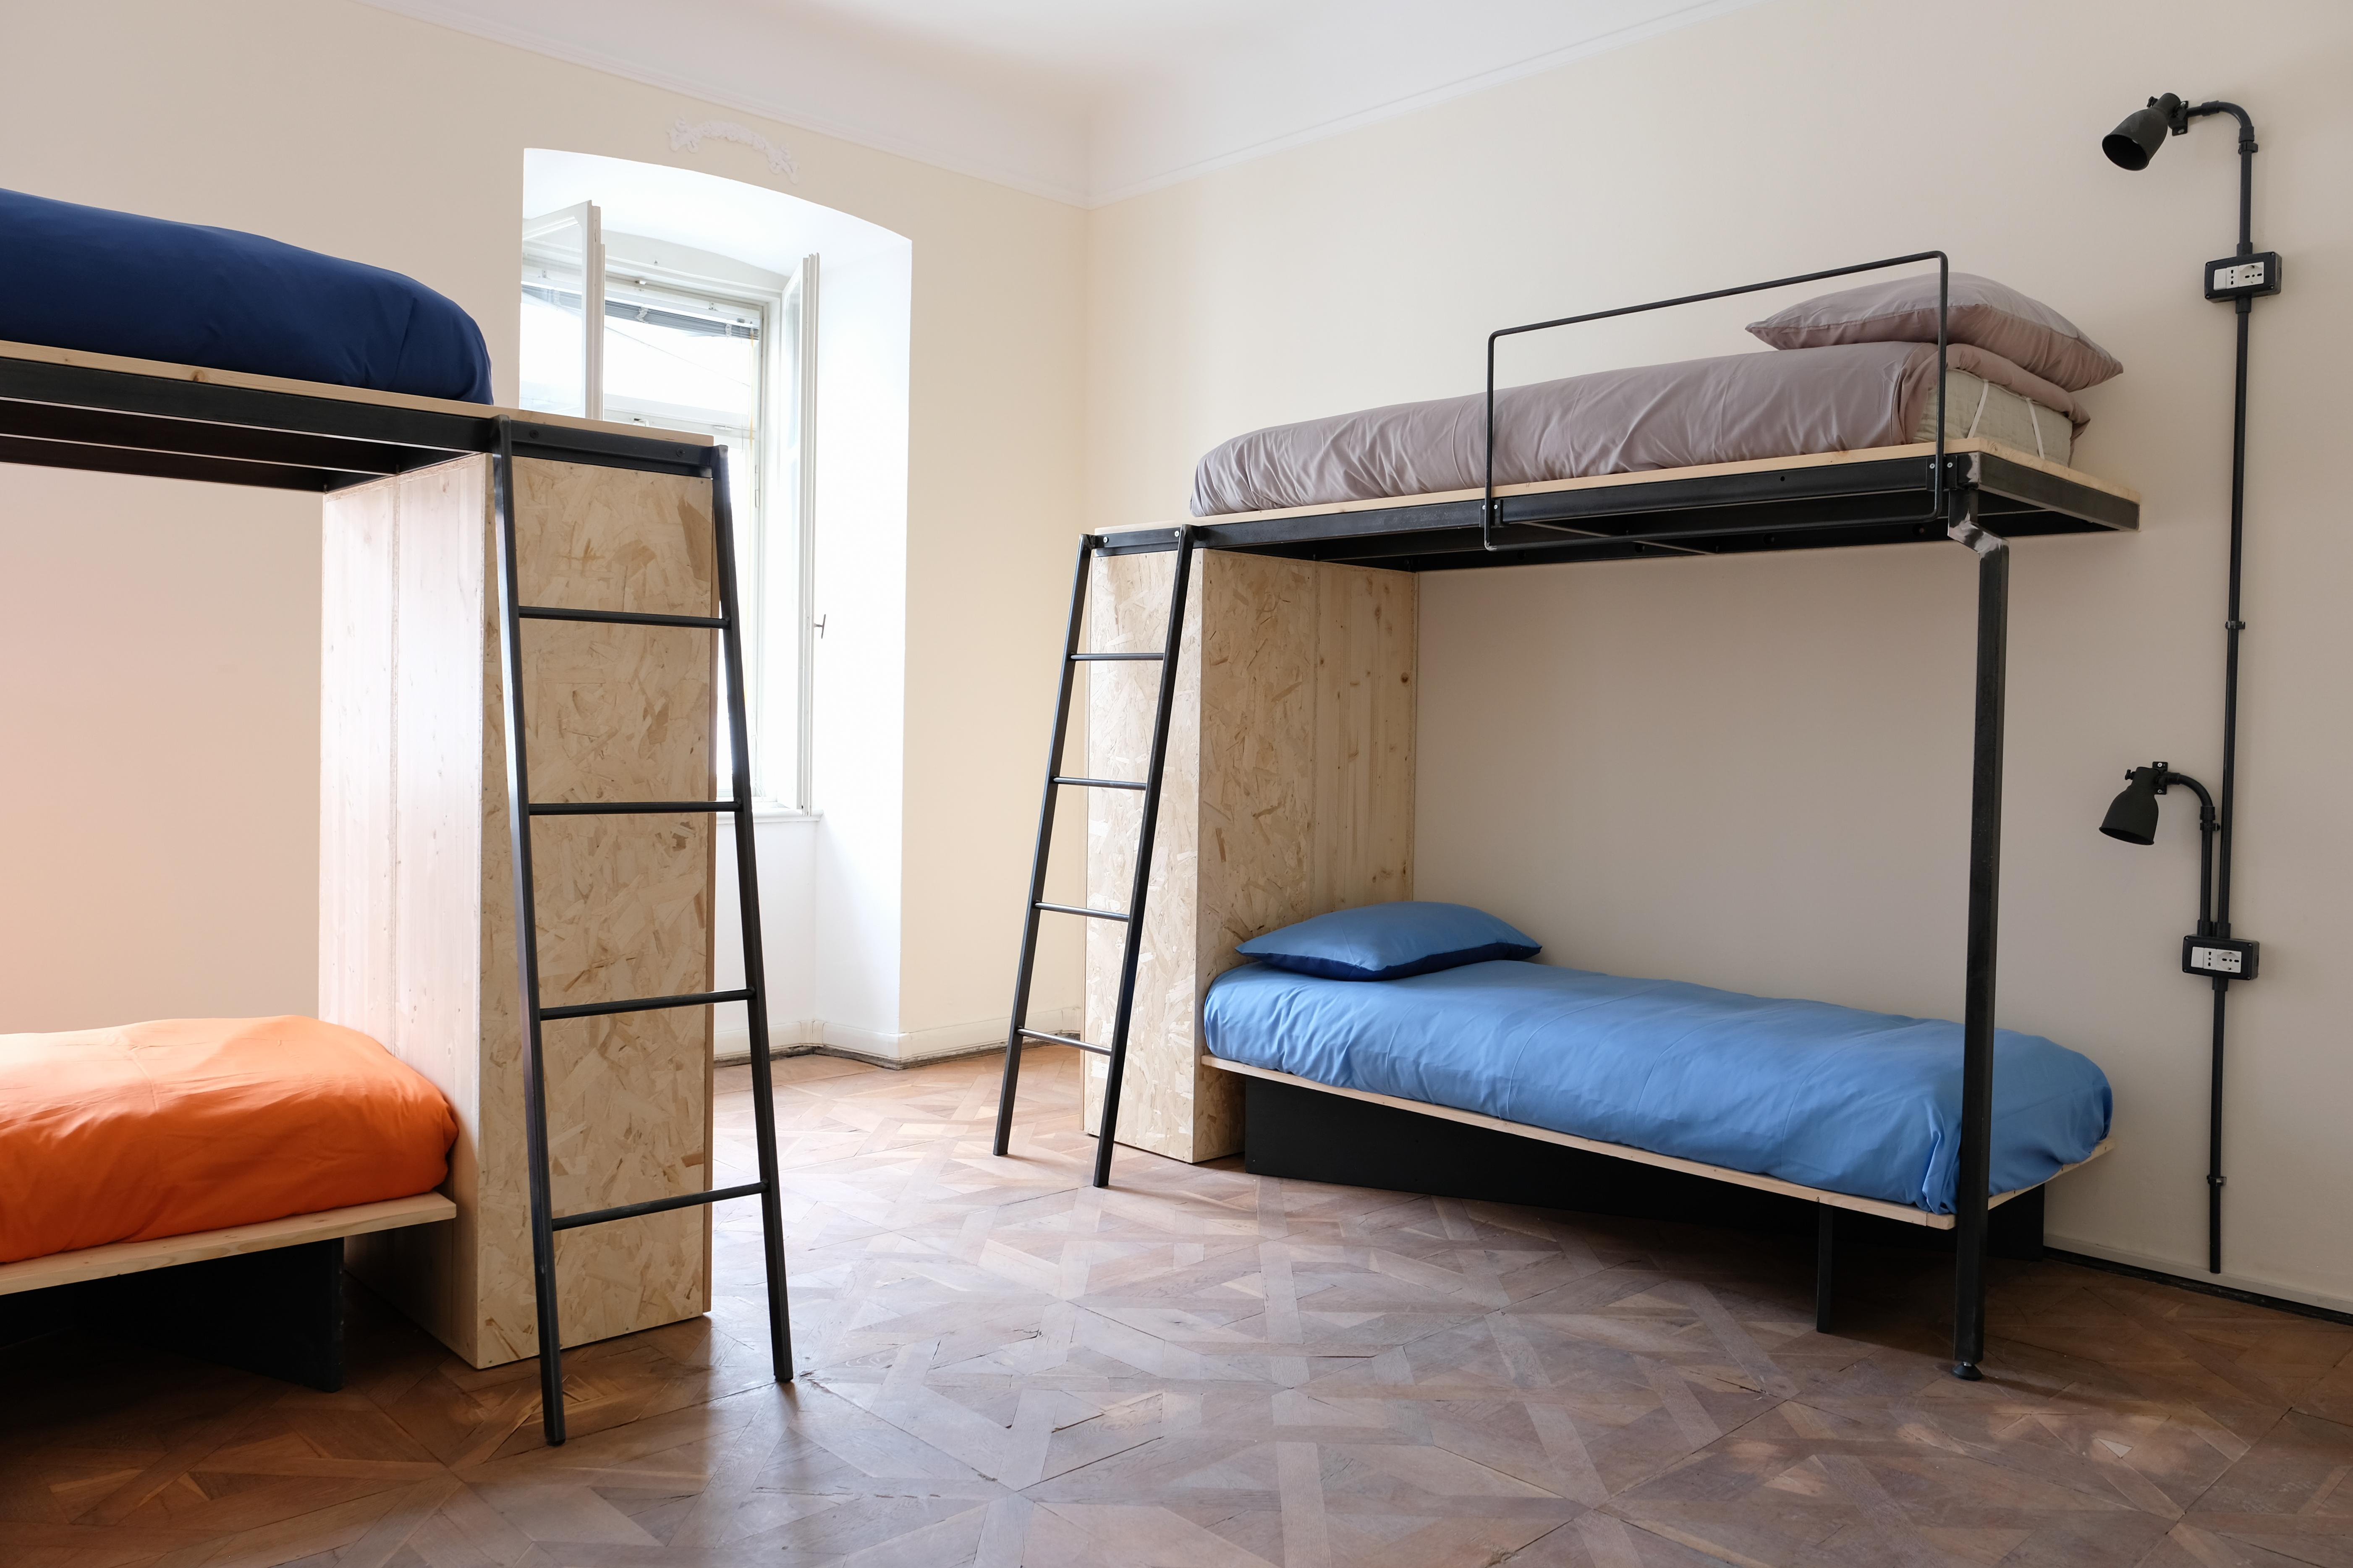 ControVento Hostel